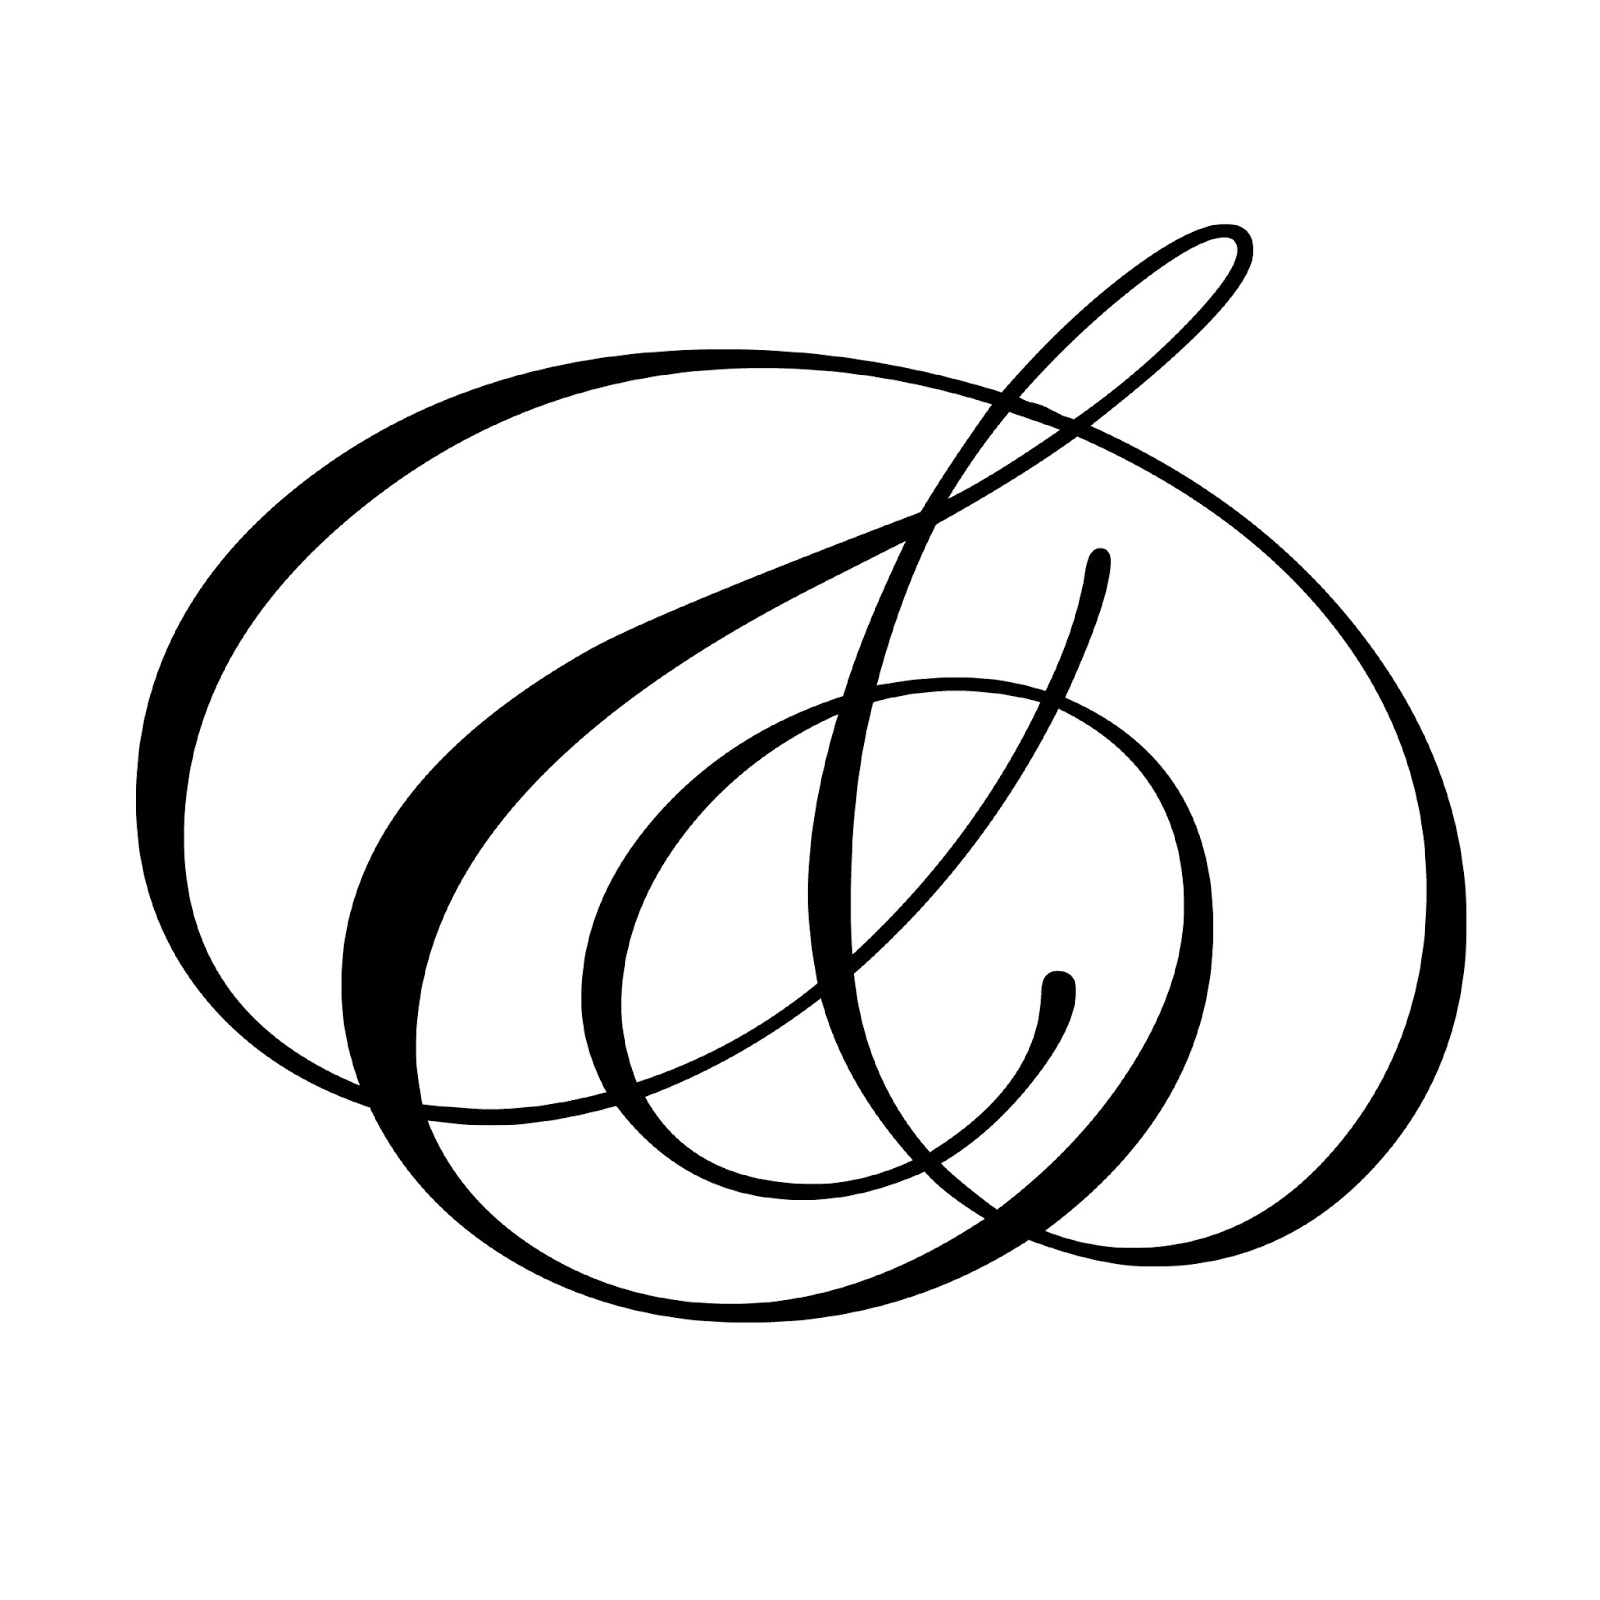 Ampersand Script Free Images At Clker